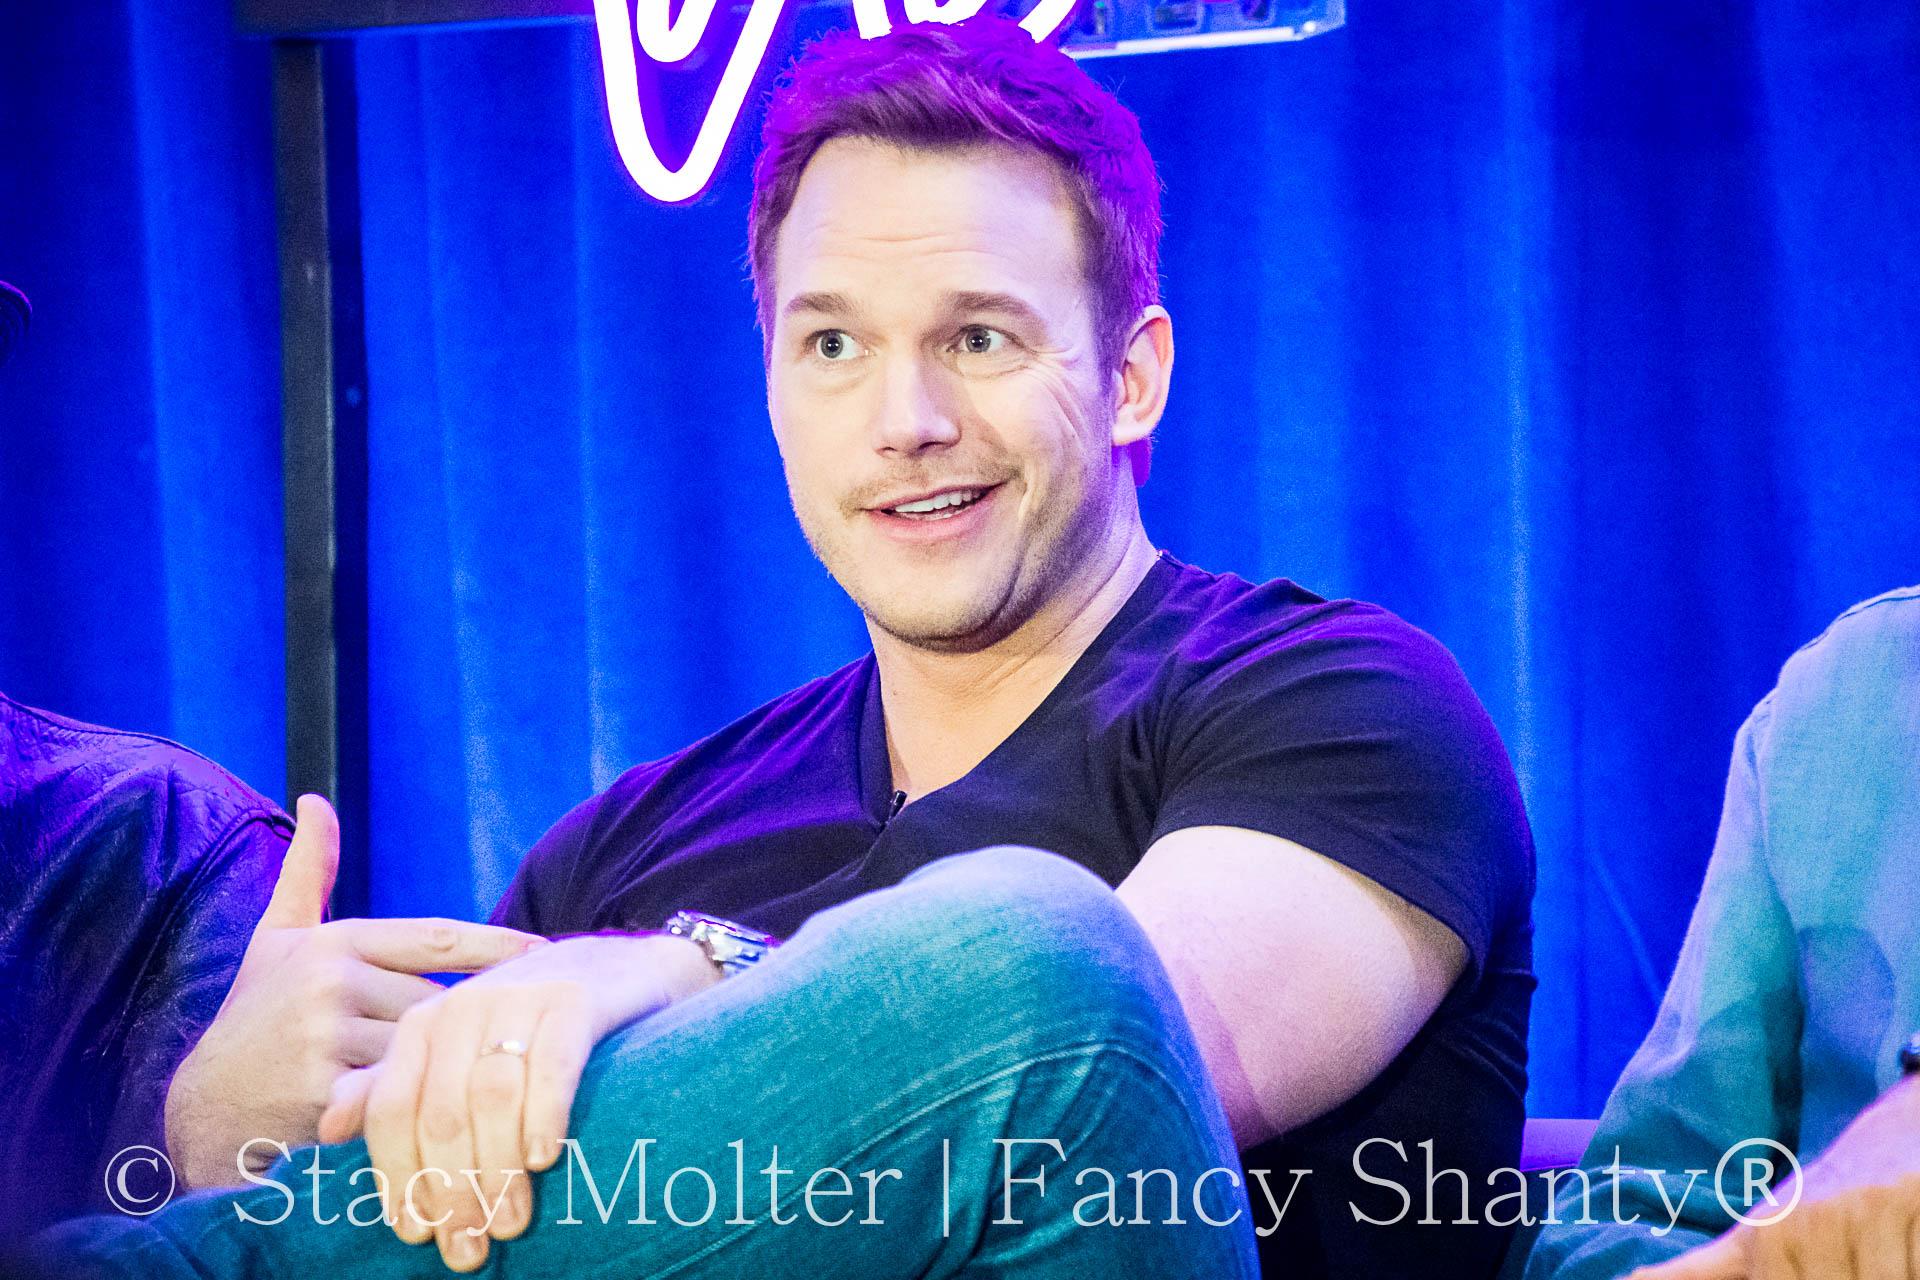 Chris Pratt - MARVEL's Guardians of the Galaxy 2 Press Conference